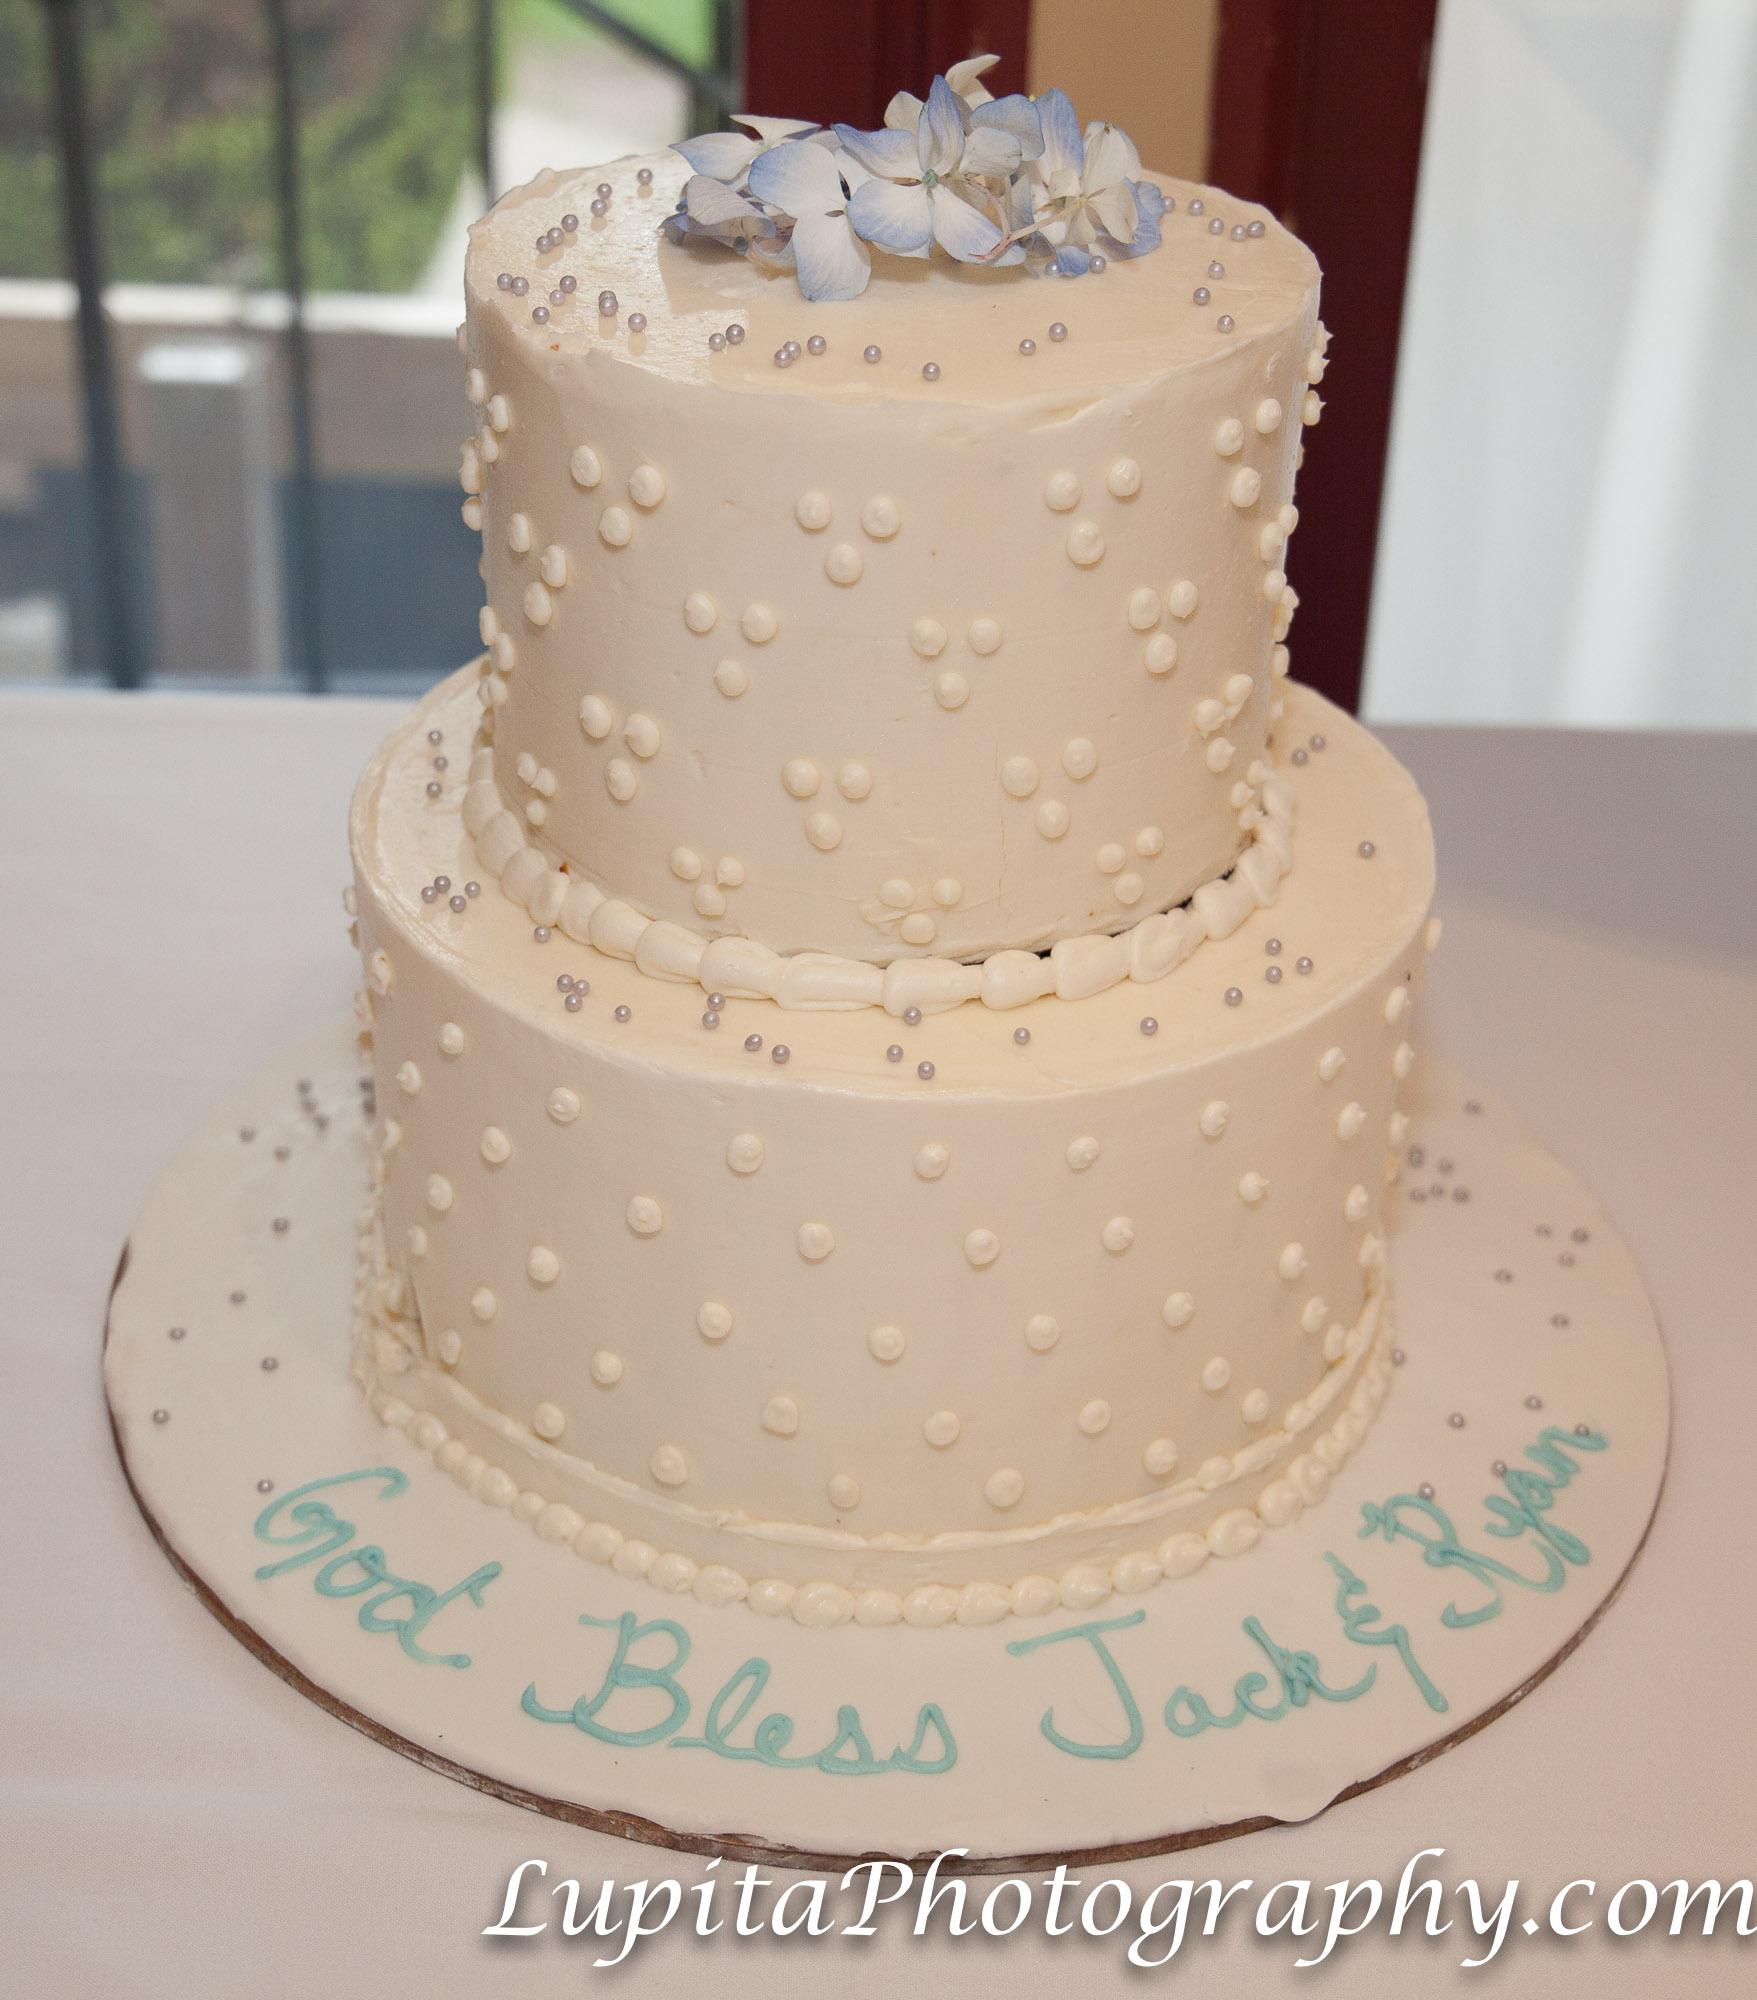 "Jack and Ryan celebrating their first communion at The Stone House at Clove Lakes in Staten Island, New York City. Jack y Ryan celebrando su primera comunión en la ""The Stone House"" en Clove Lakes en Staten Island, Ciudad de Nueva York."